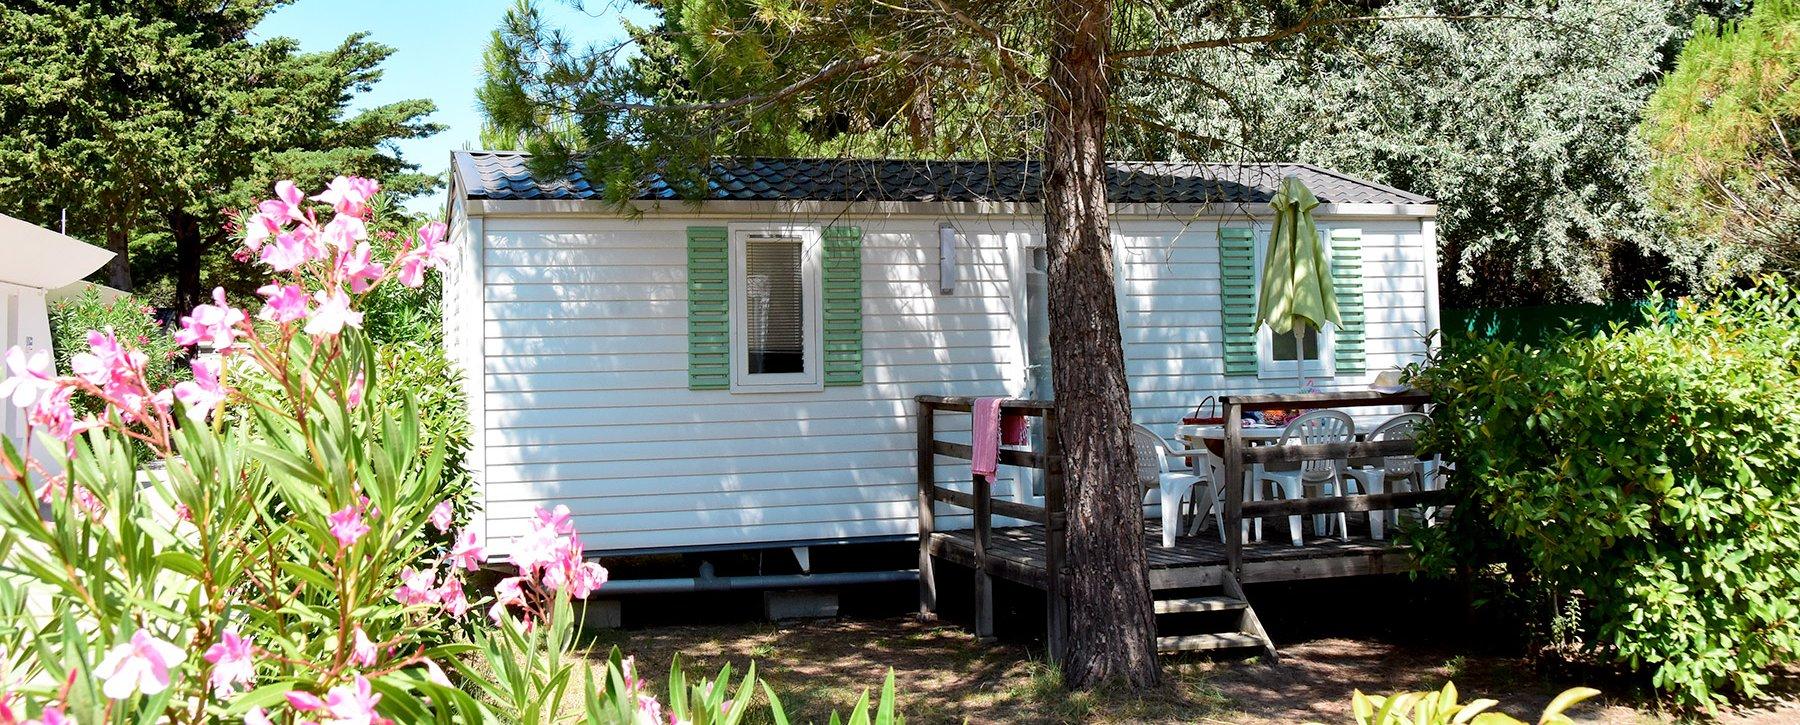 Location De Mobil Homes A La Grande Motte Au Camping Le Garden